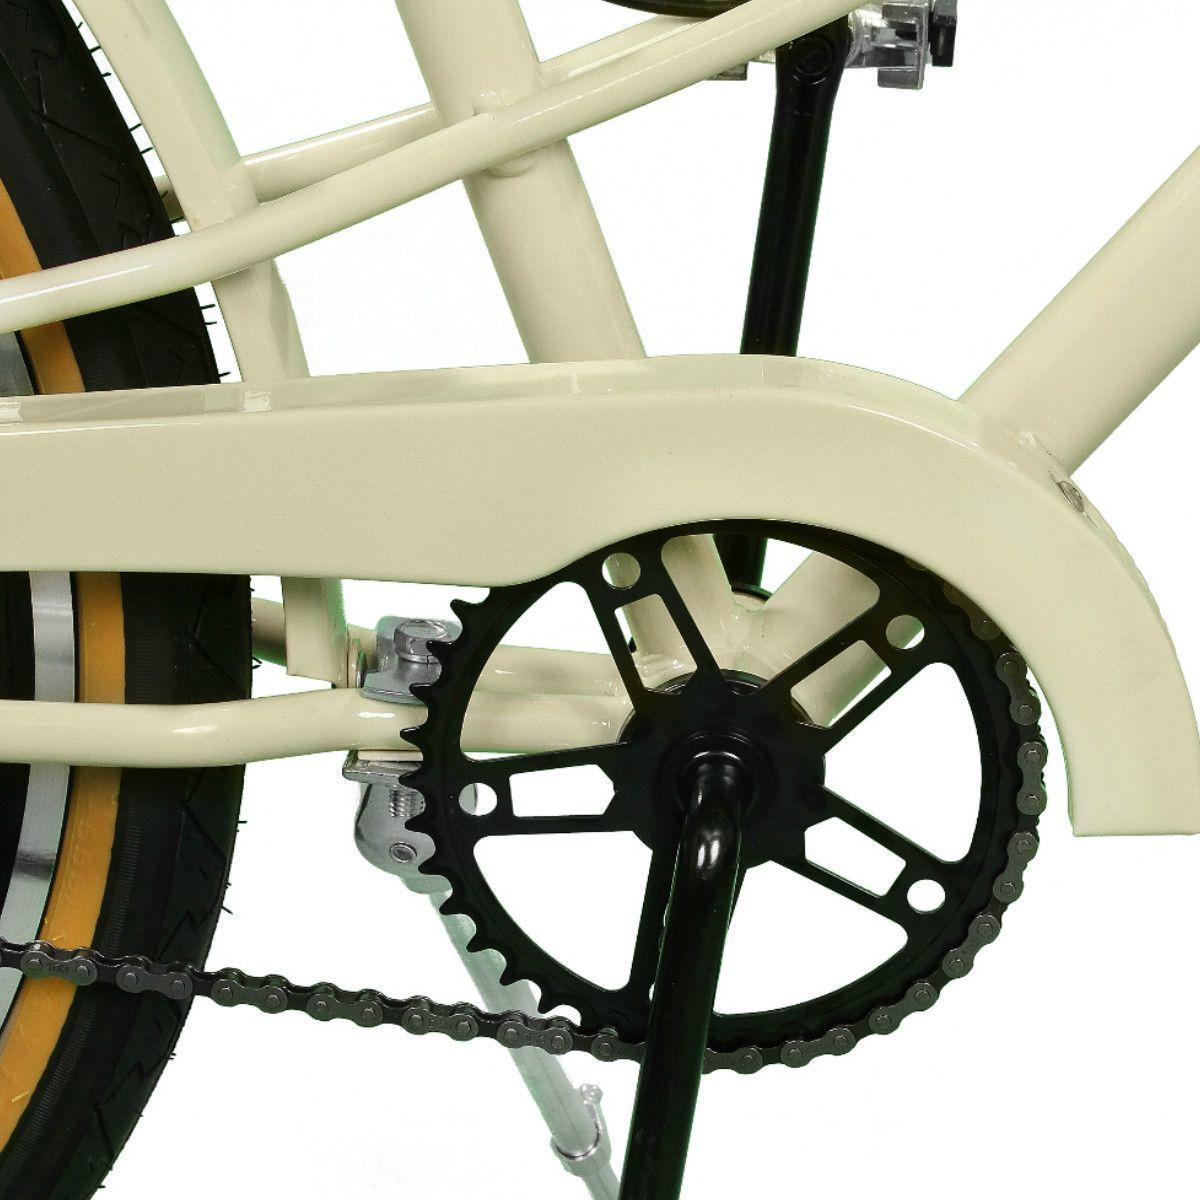 Bicicleta Master Bike Aro 26 Bella Retrô Freio V-Brake Bege